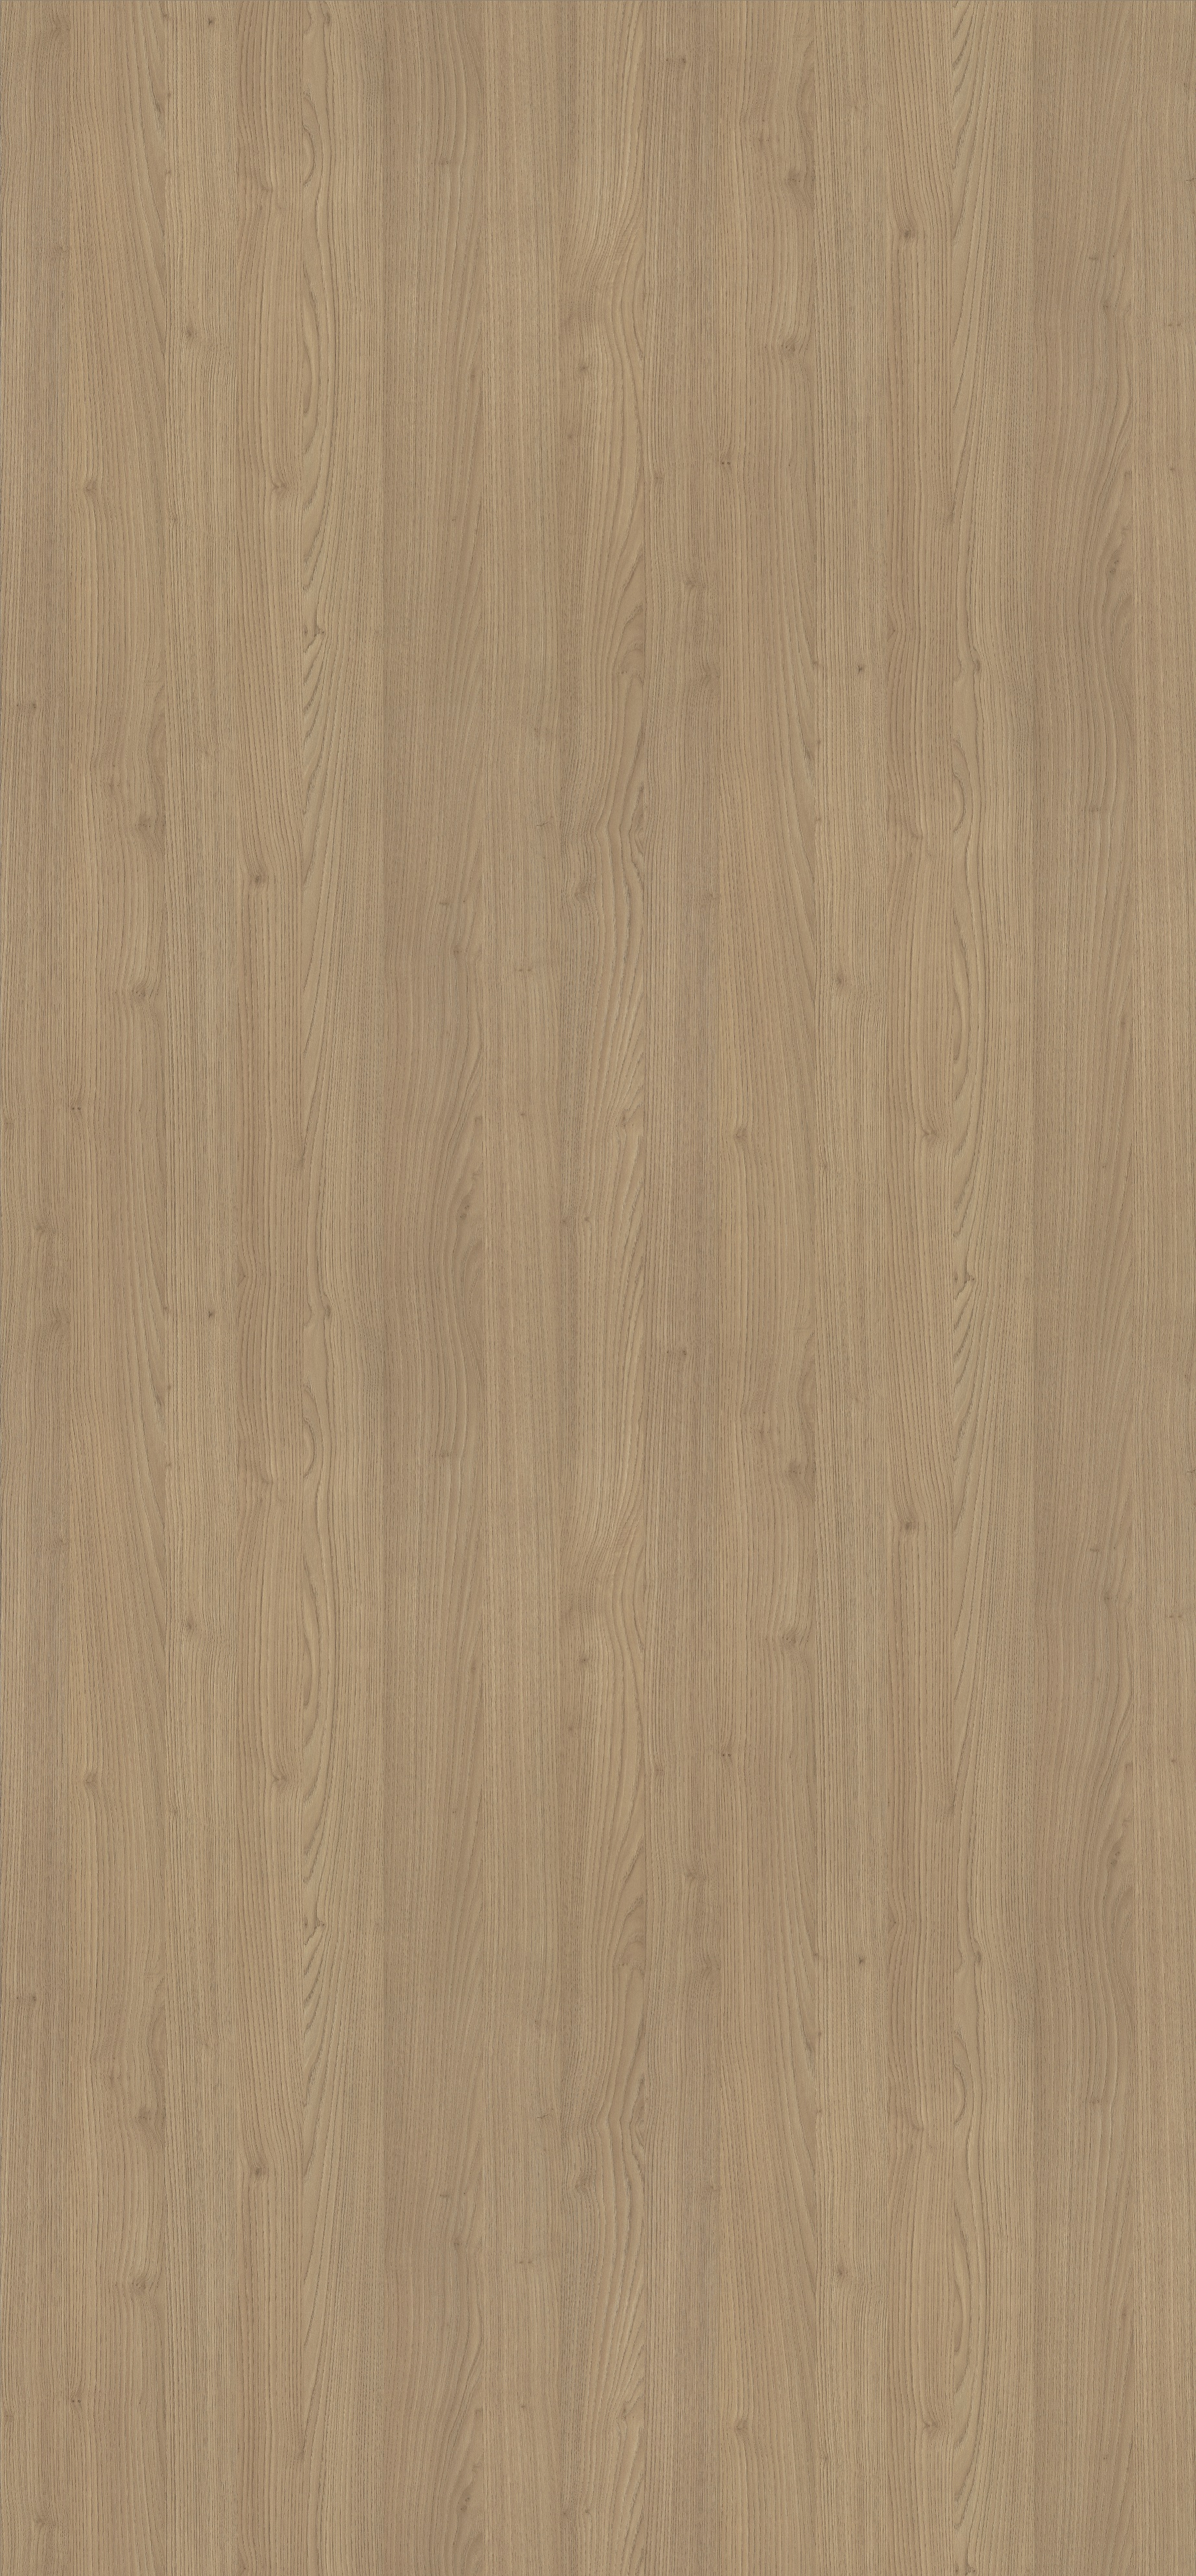 neue dekore neue strukturen egger zoom 2014. Black Bedroom Furniture Sets. Home Design Ideas